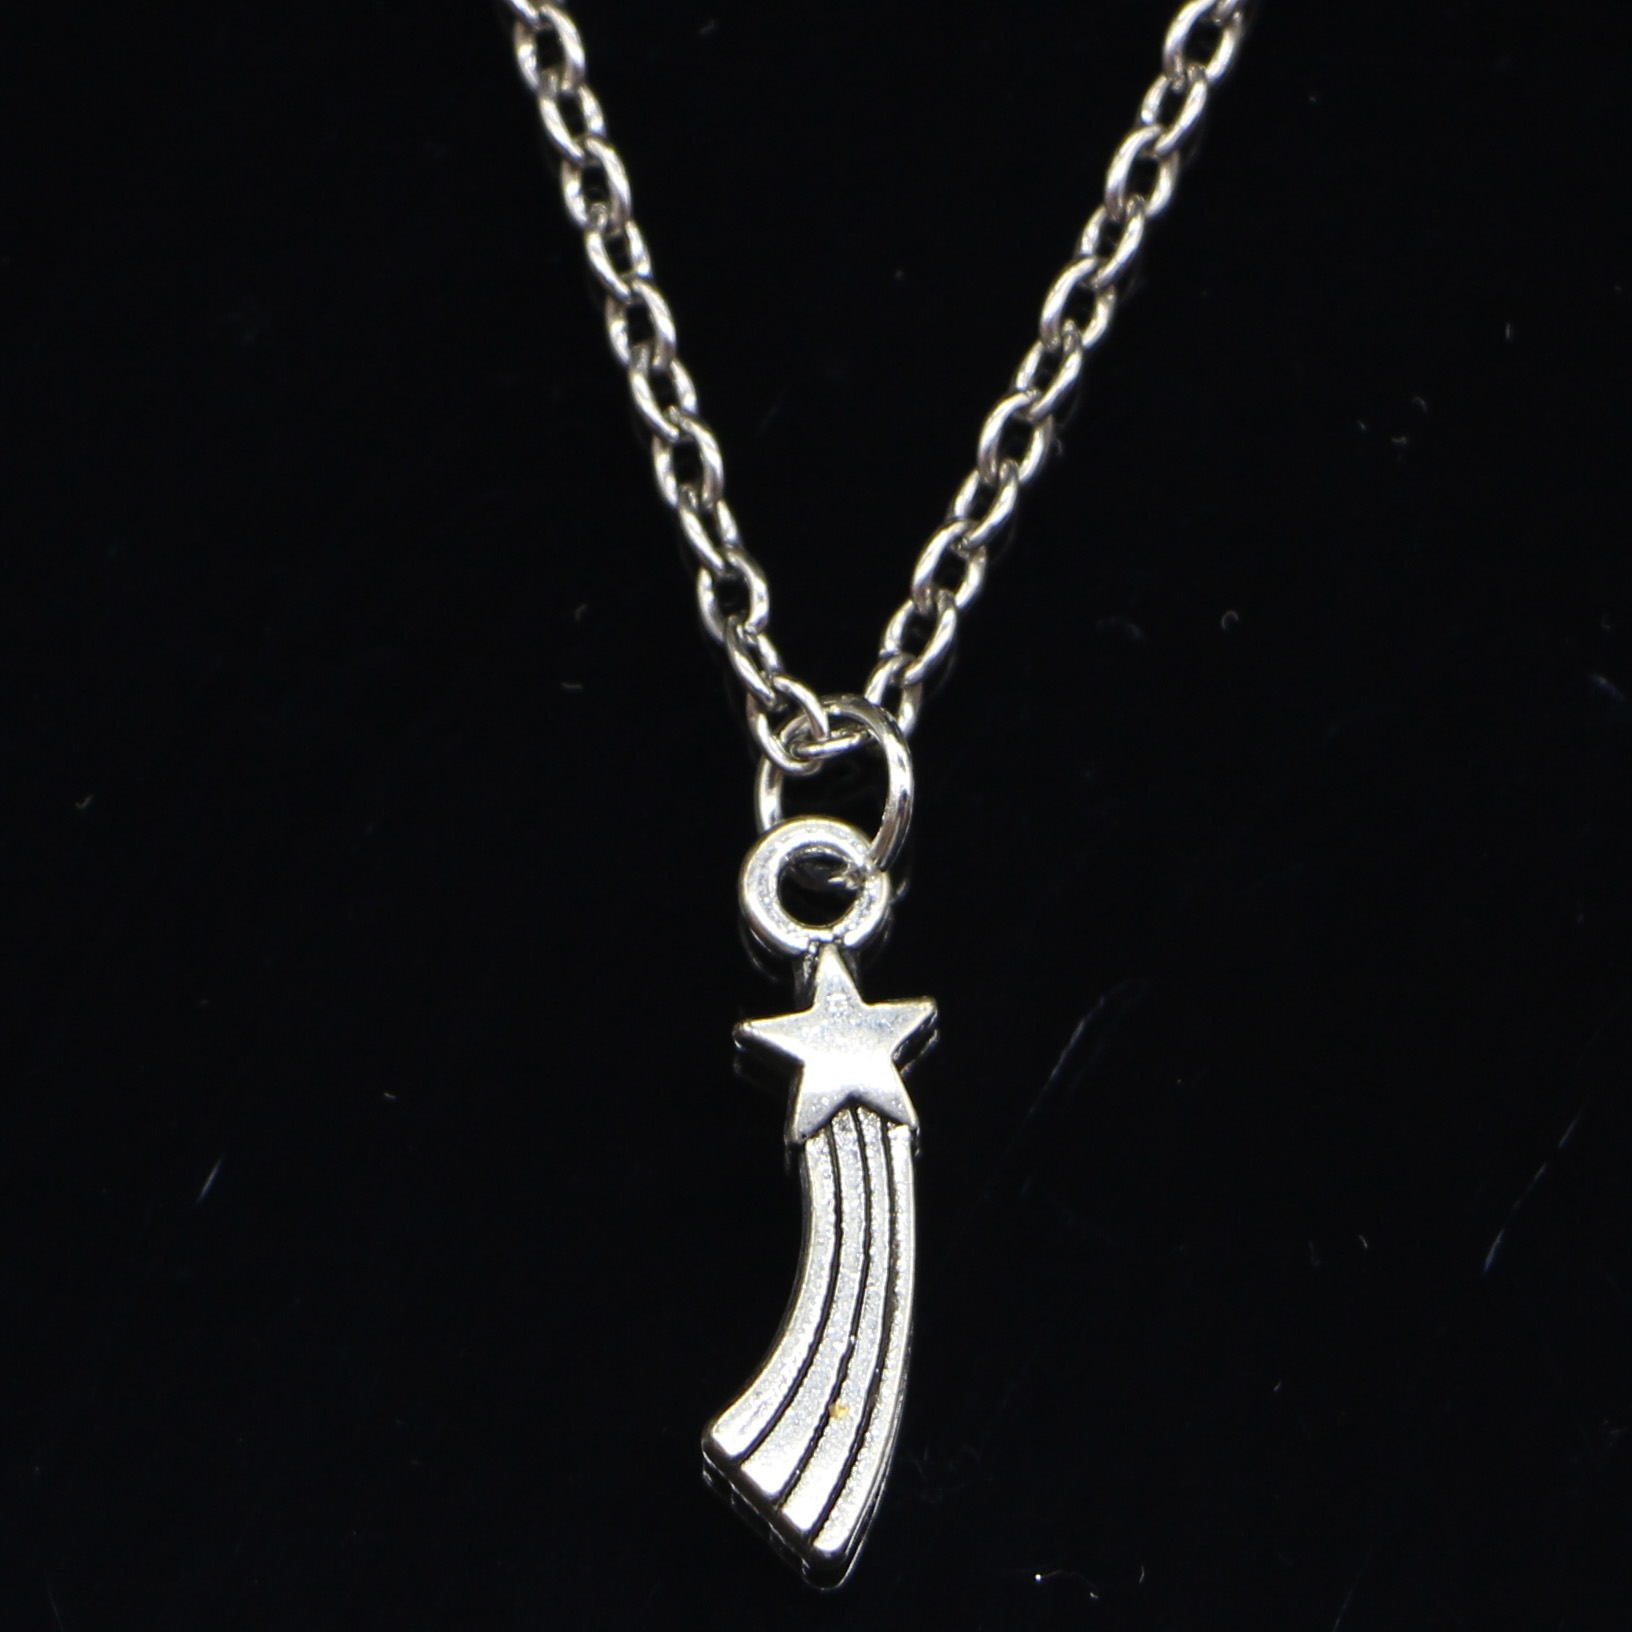 20pcs New Fashion Necklace 20x5mm shooting star Pendants Short Long Women Men Colar Gift Jewelry Choker